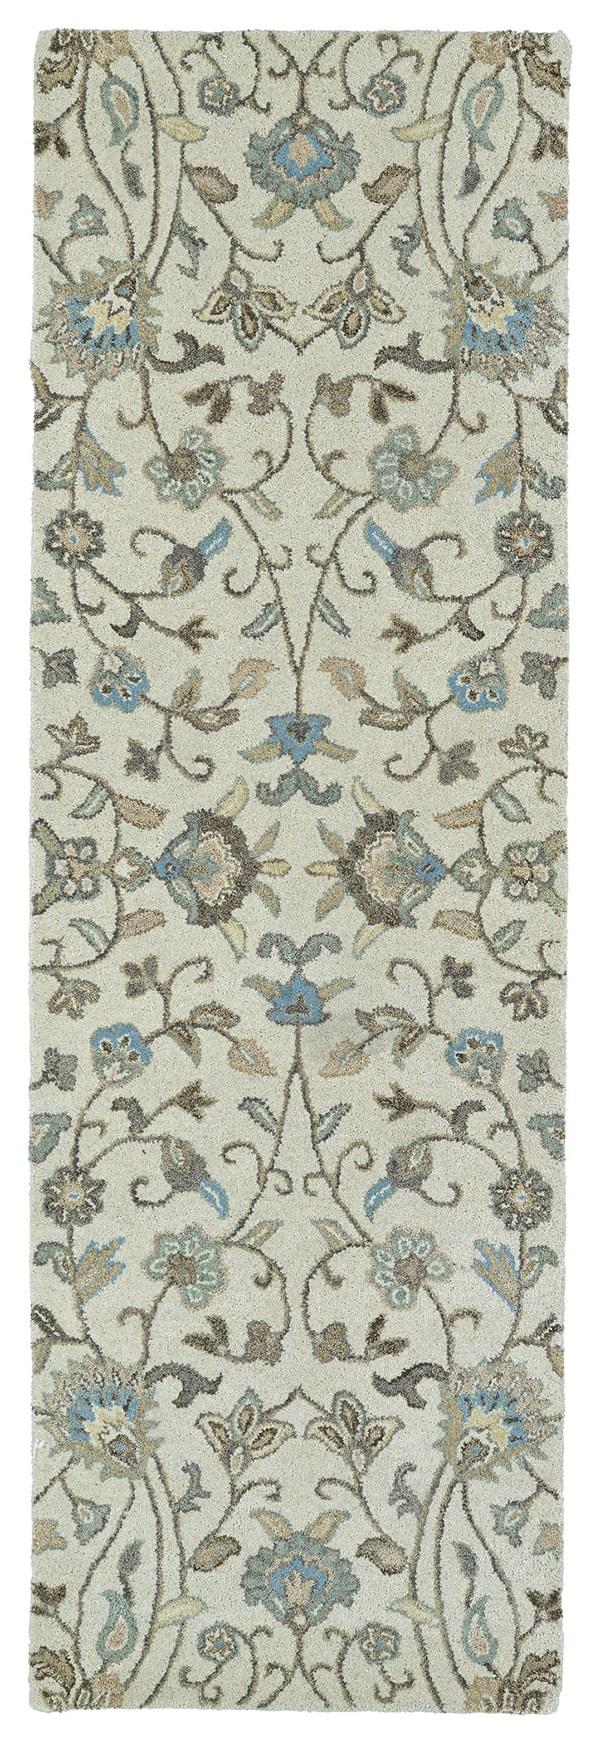 Beige, Light Blue, Light Brown (03) Traditional / Oriental Area Rug